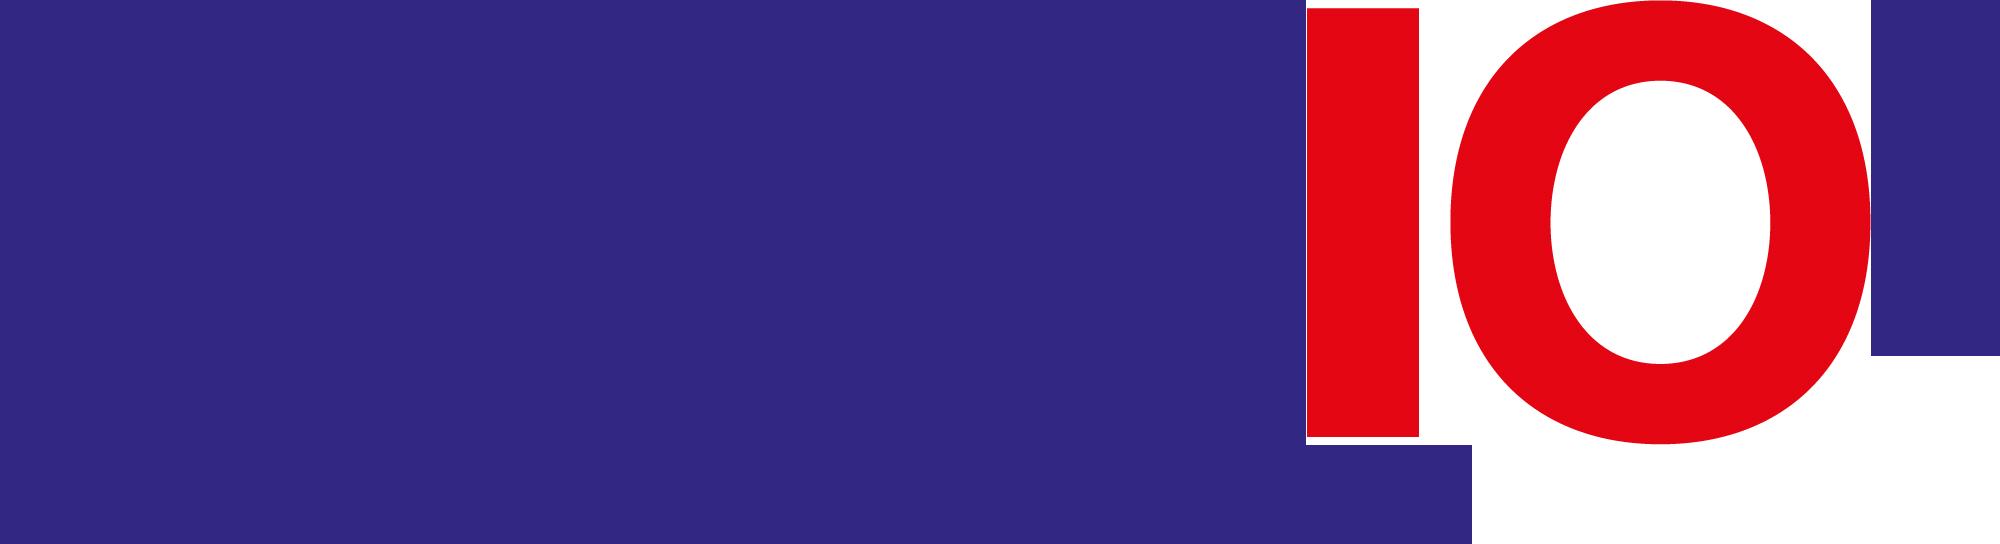 EasyIO Holdings Logo